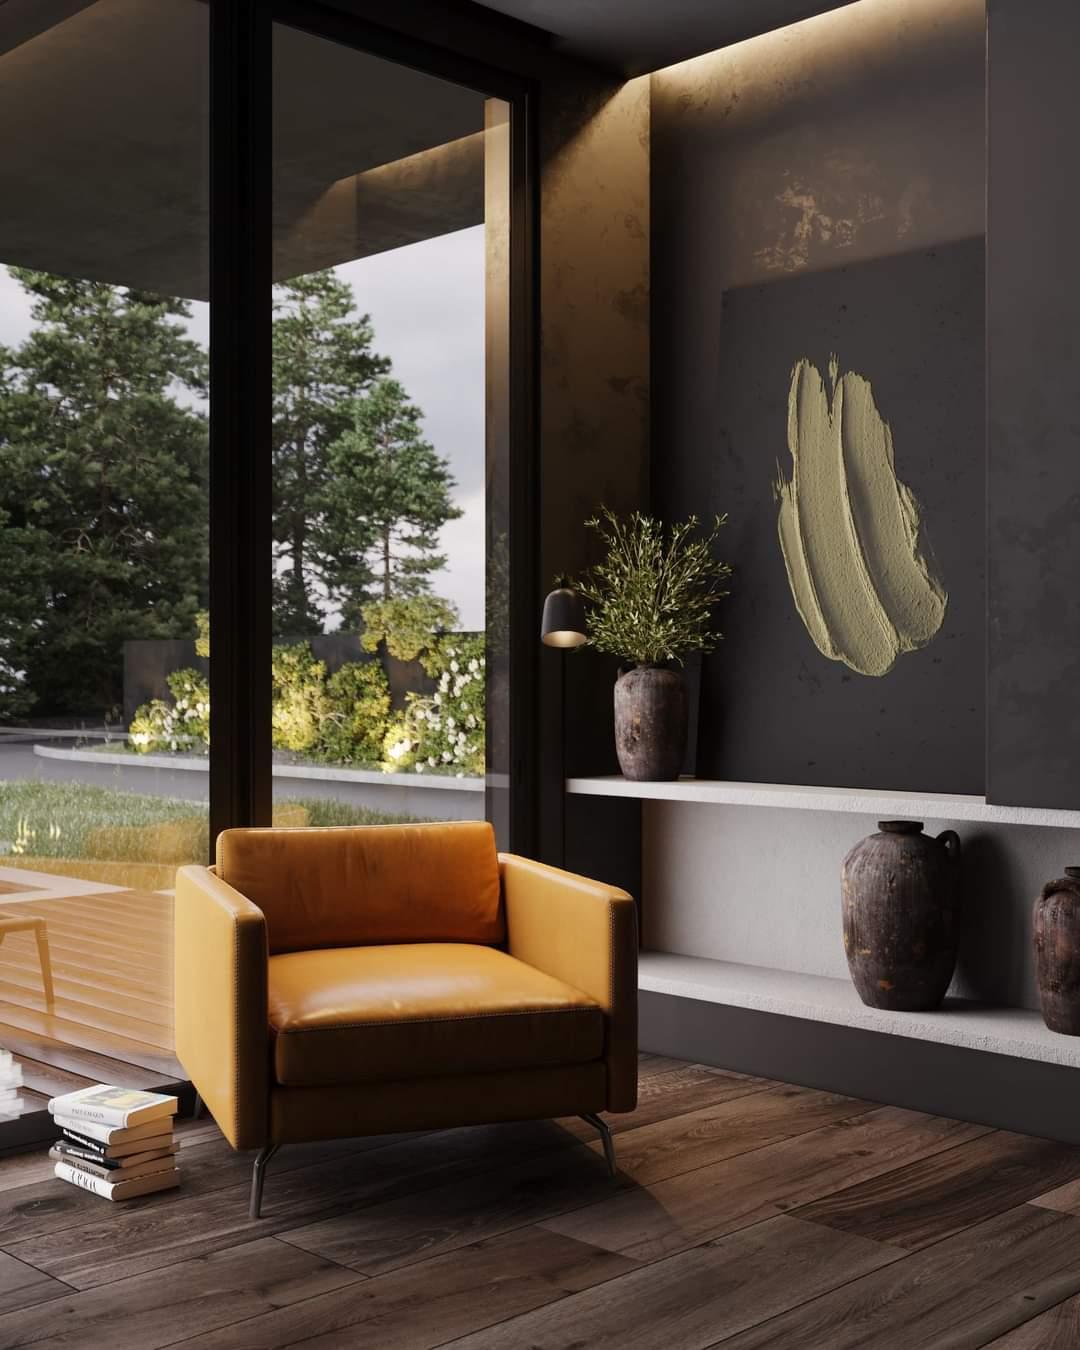 Comfortable Orange Sofa Set - Source: Kireevaaanna